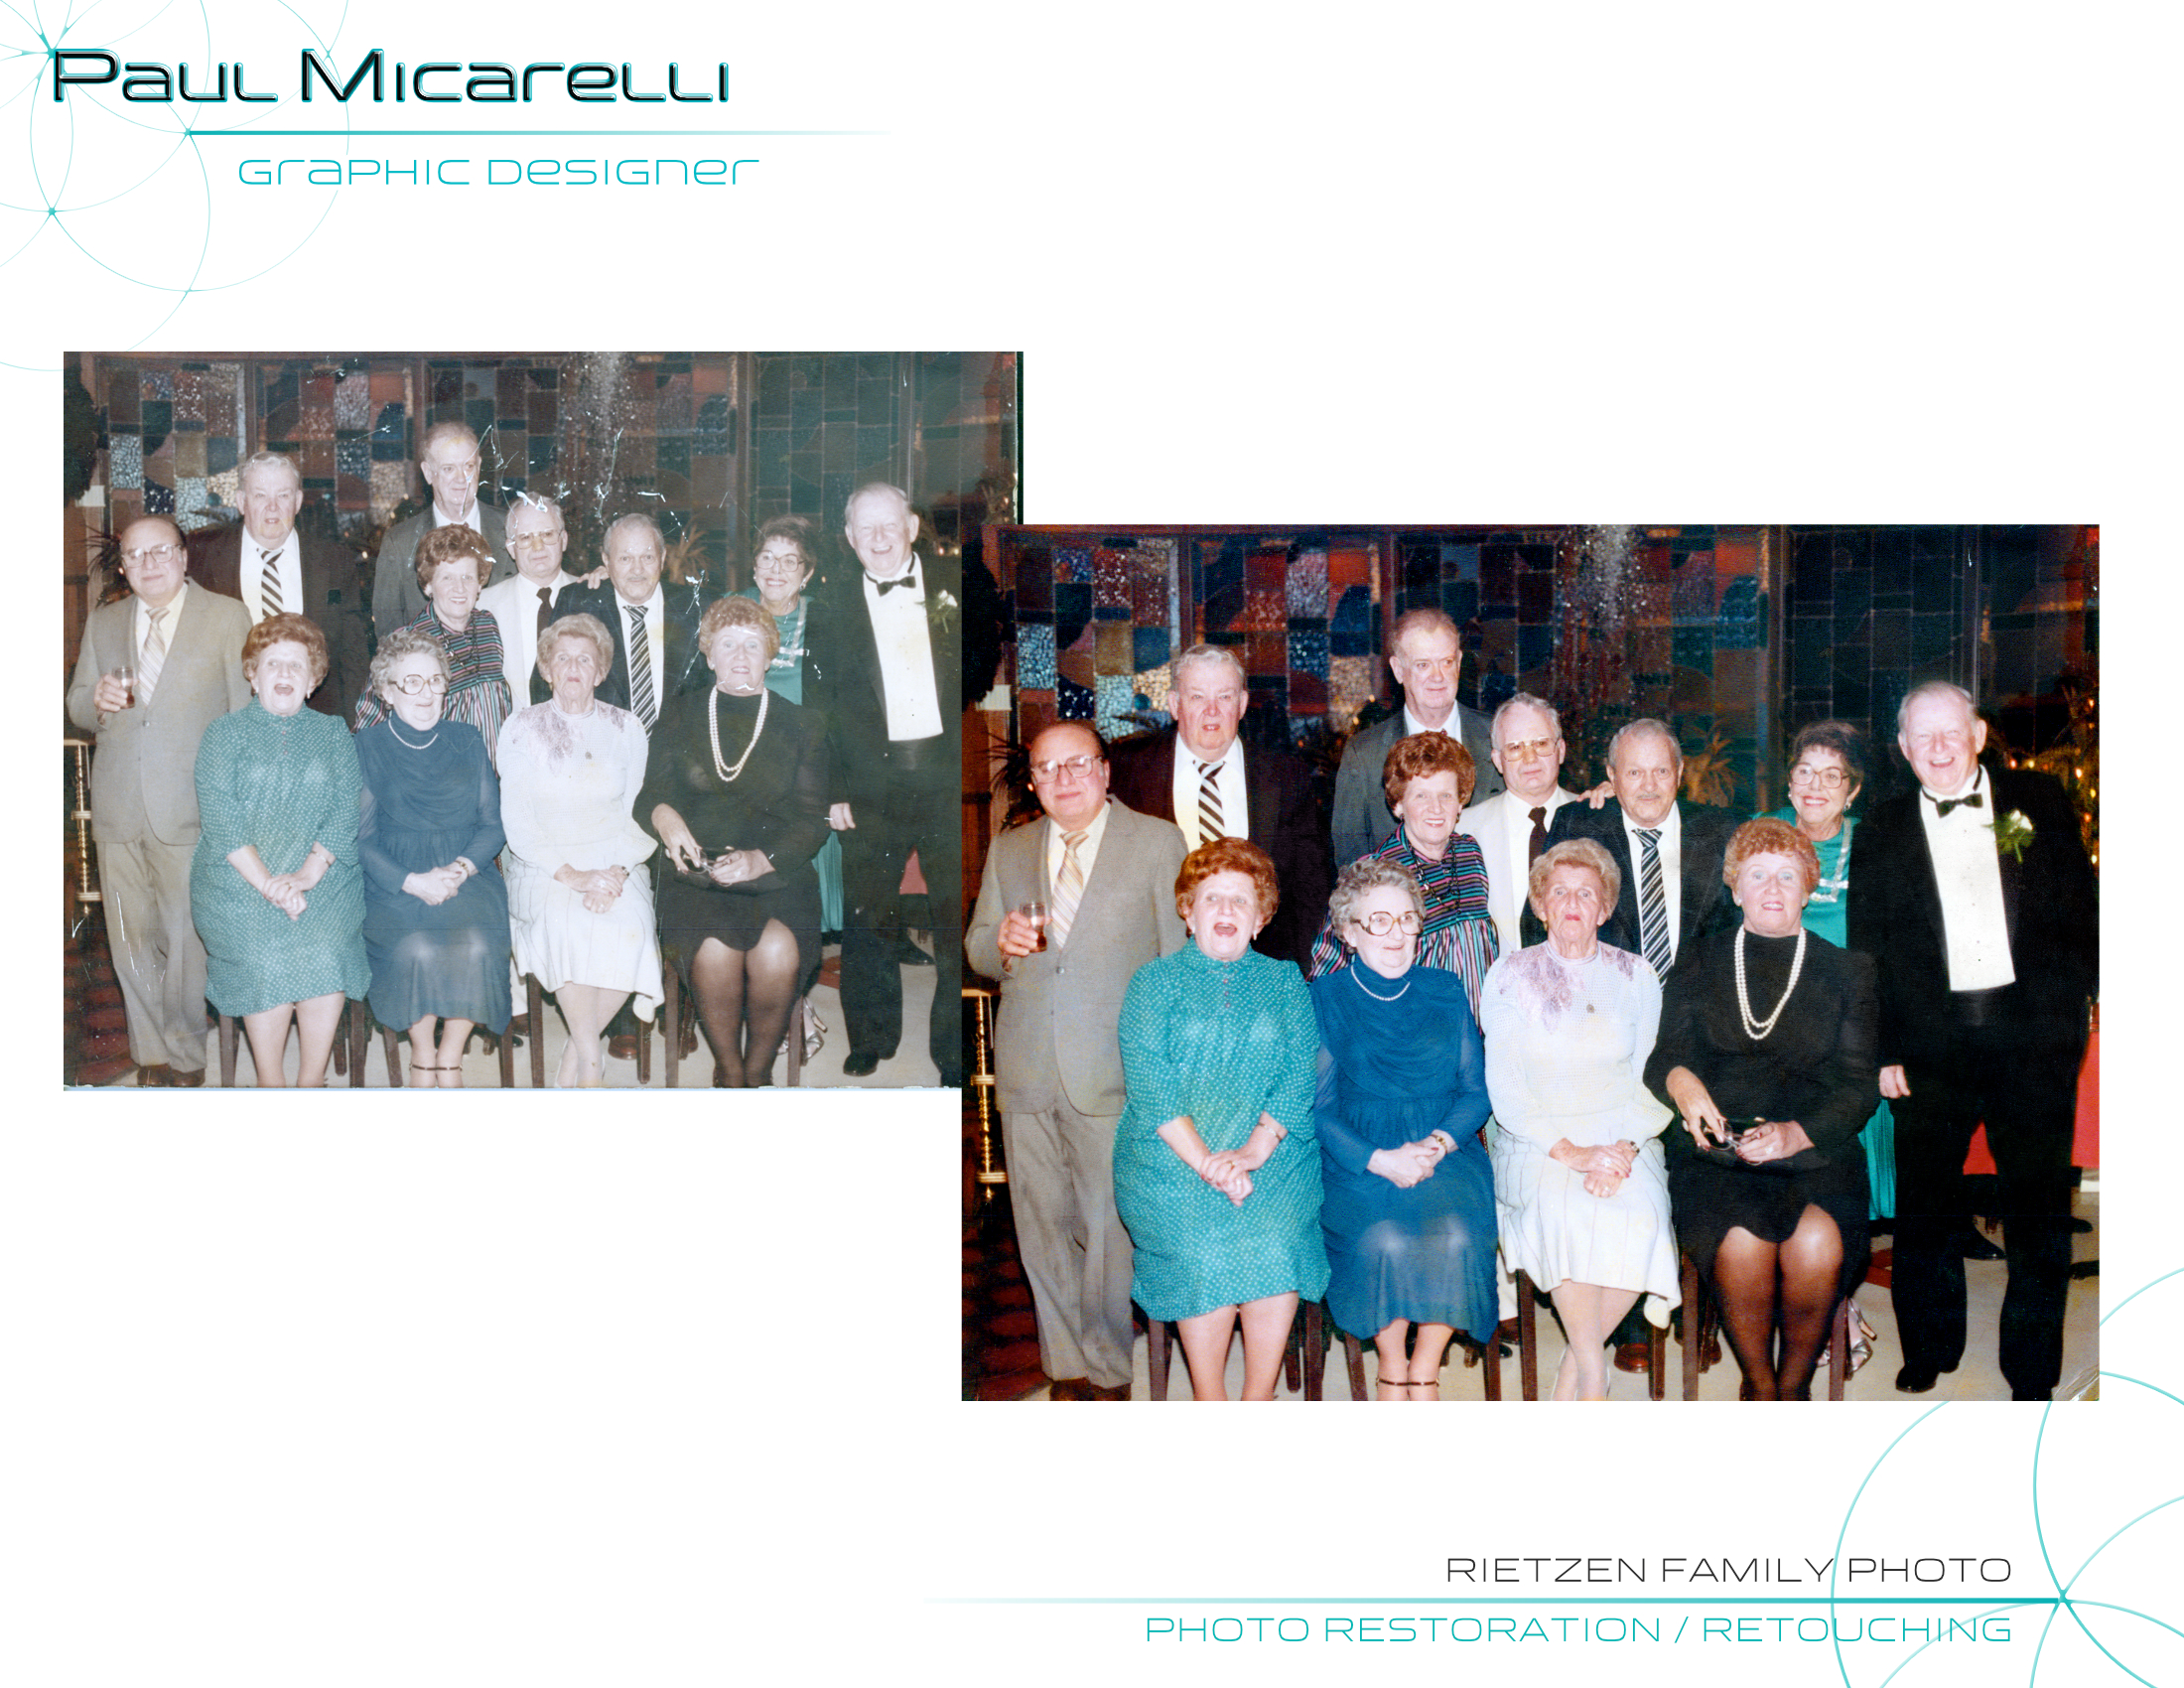 Paul-Micarelli-Rietzen Family Photo